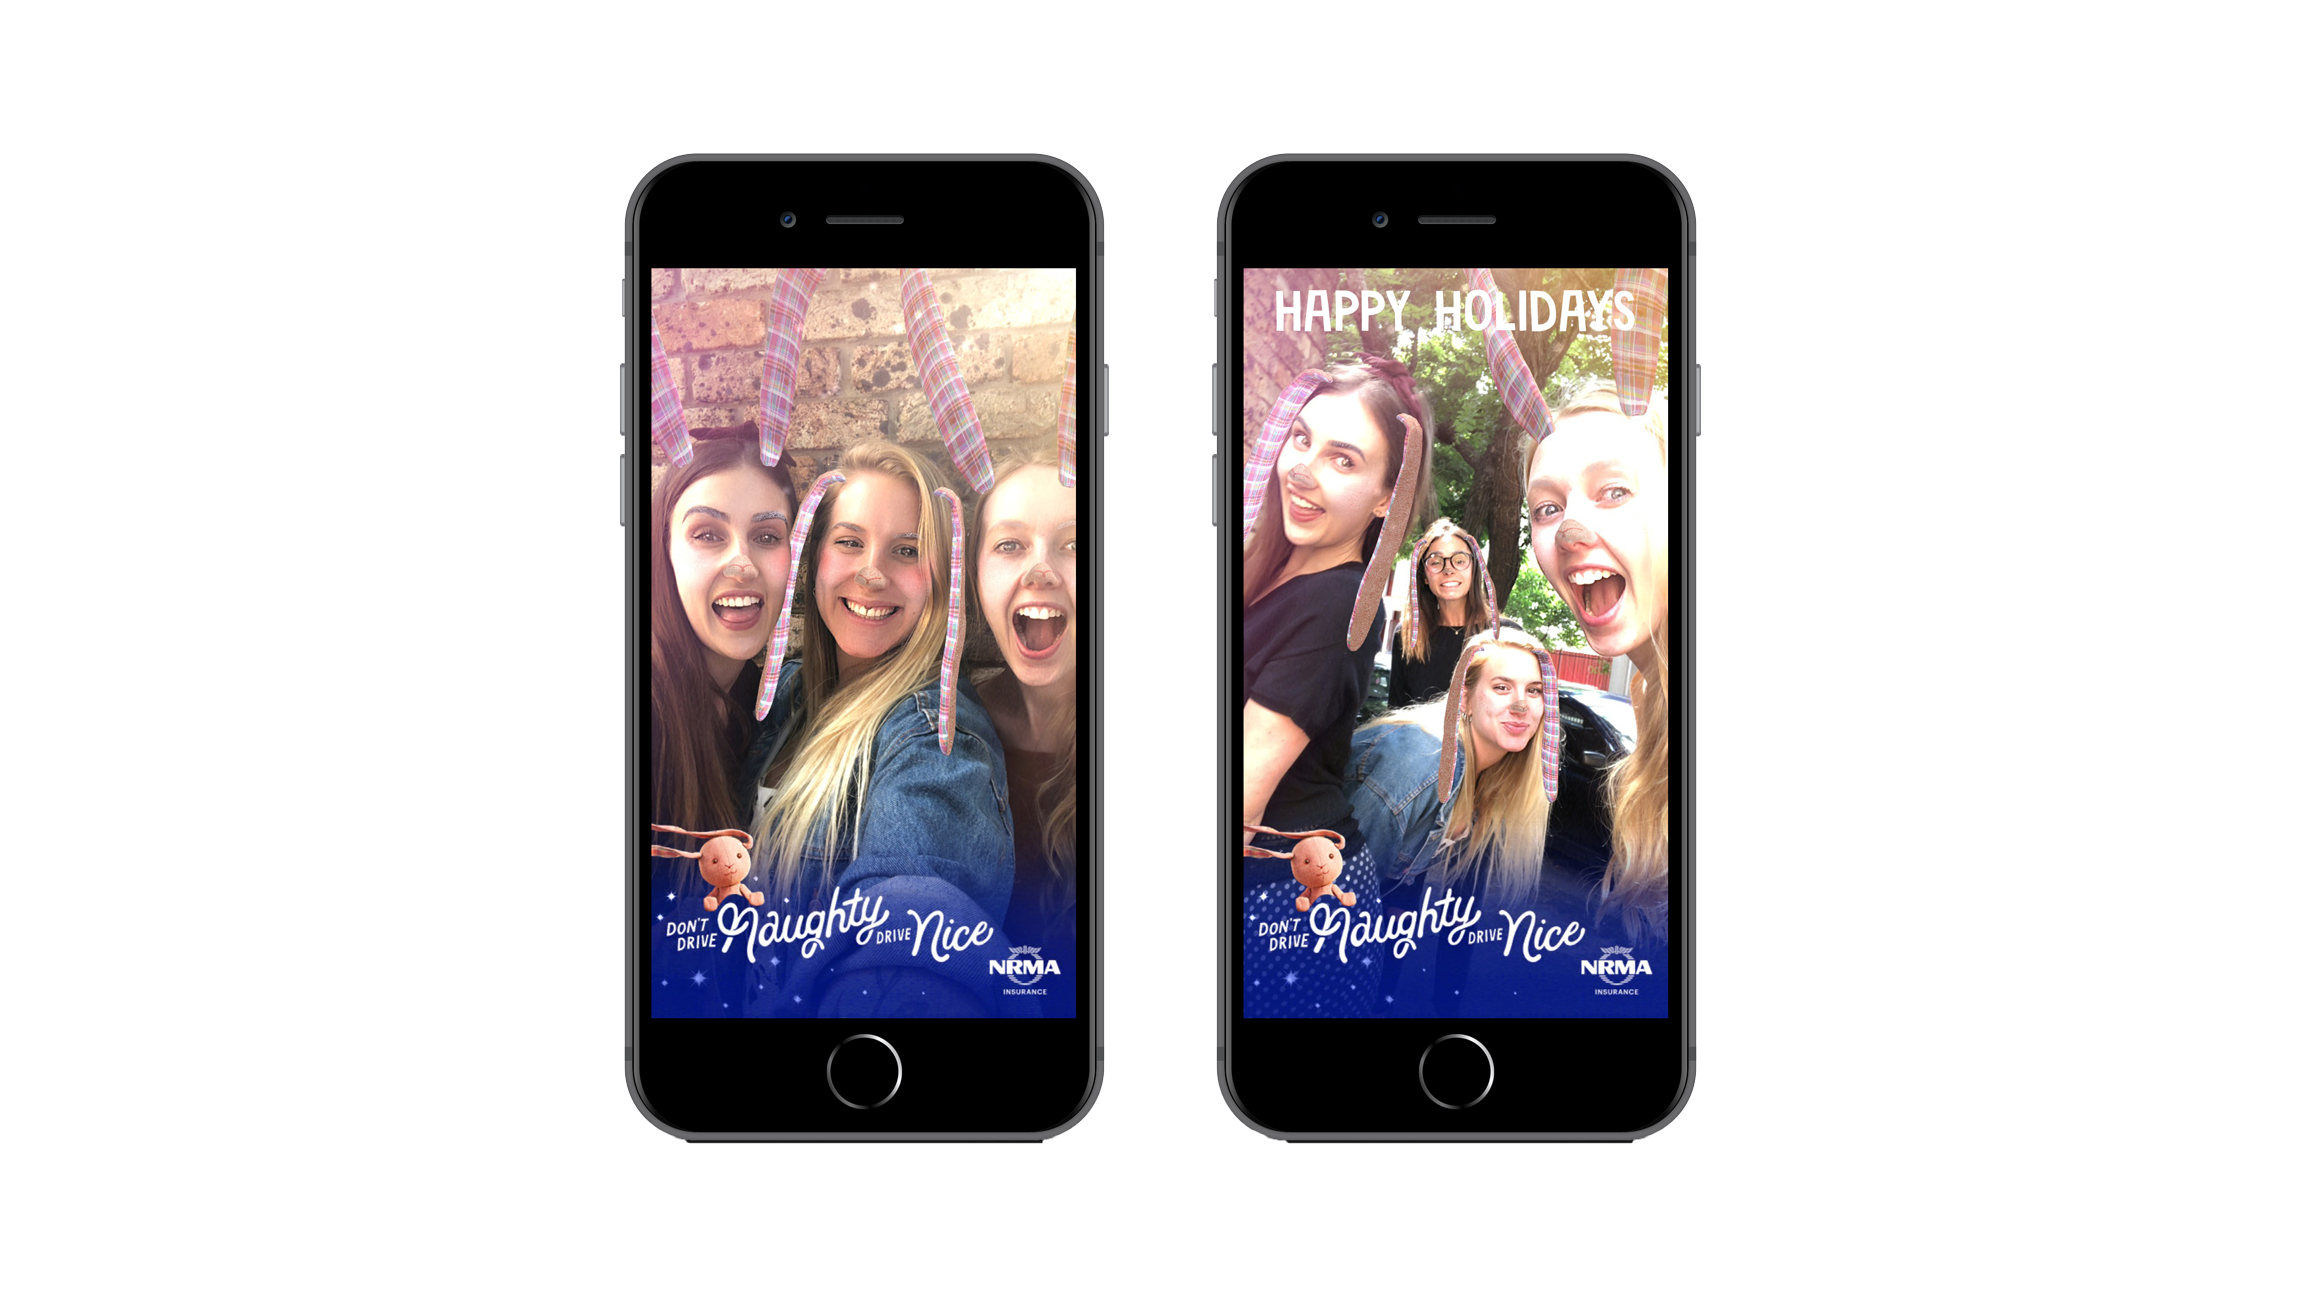 NRMA - Christmas Facebook AR Lens